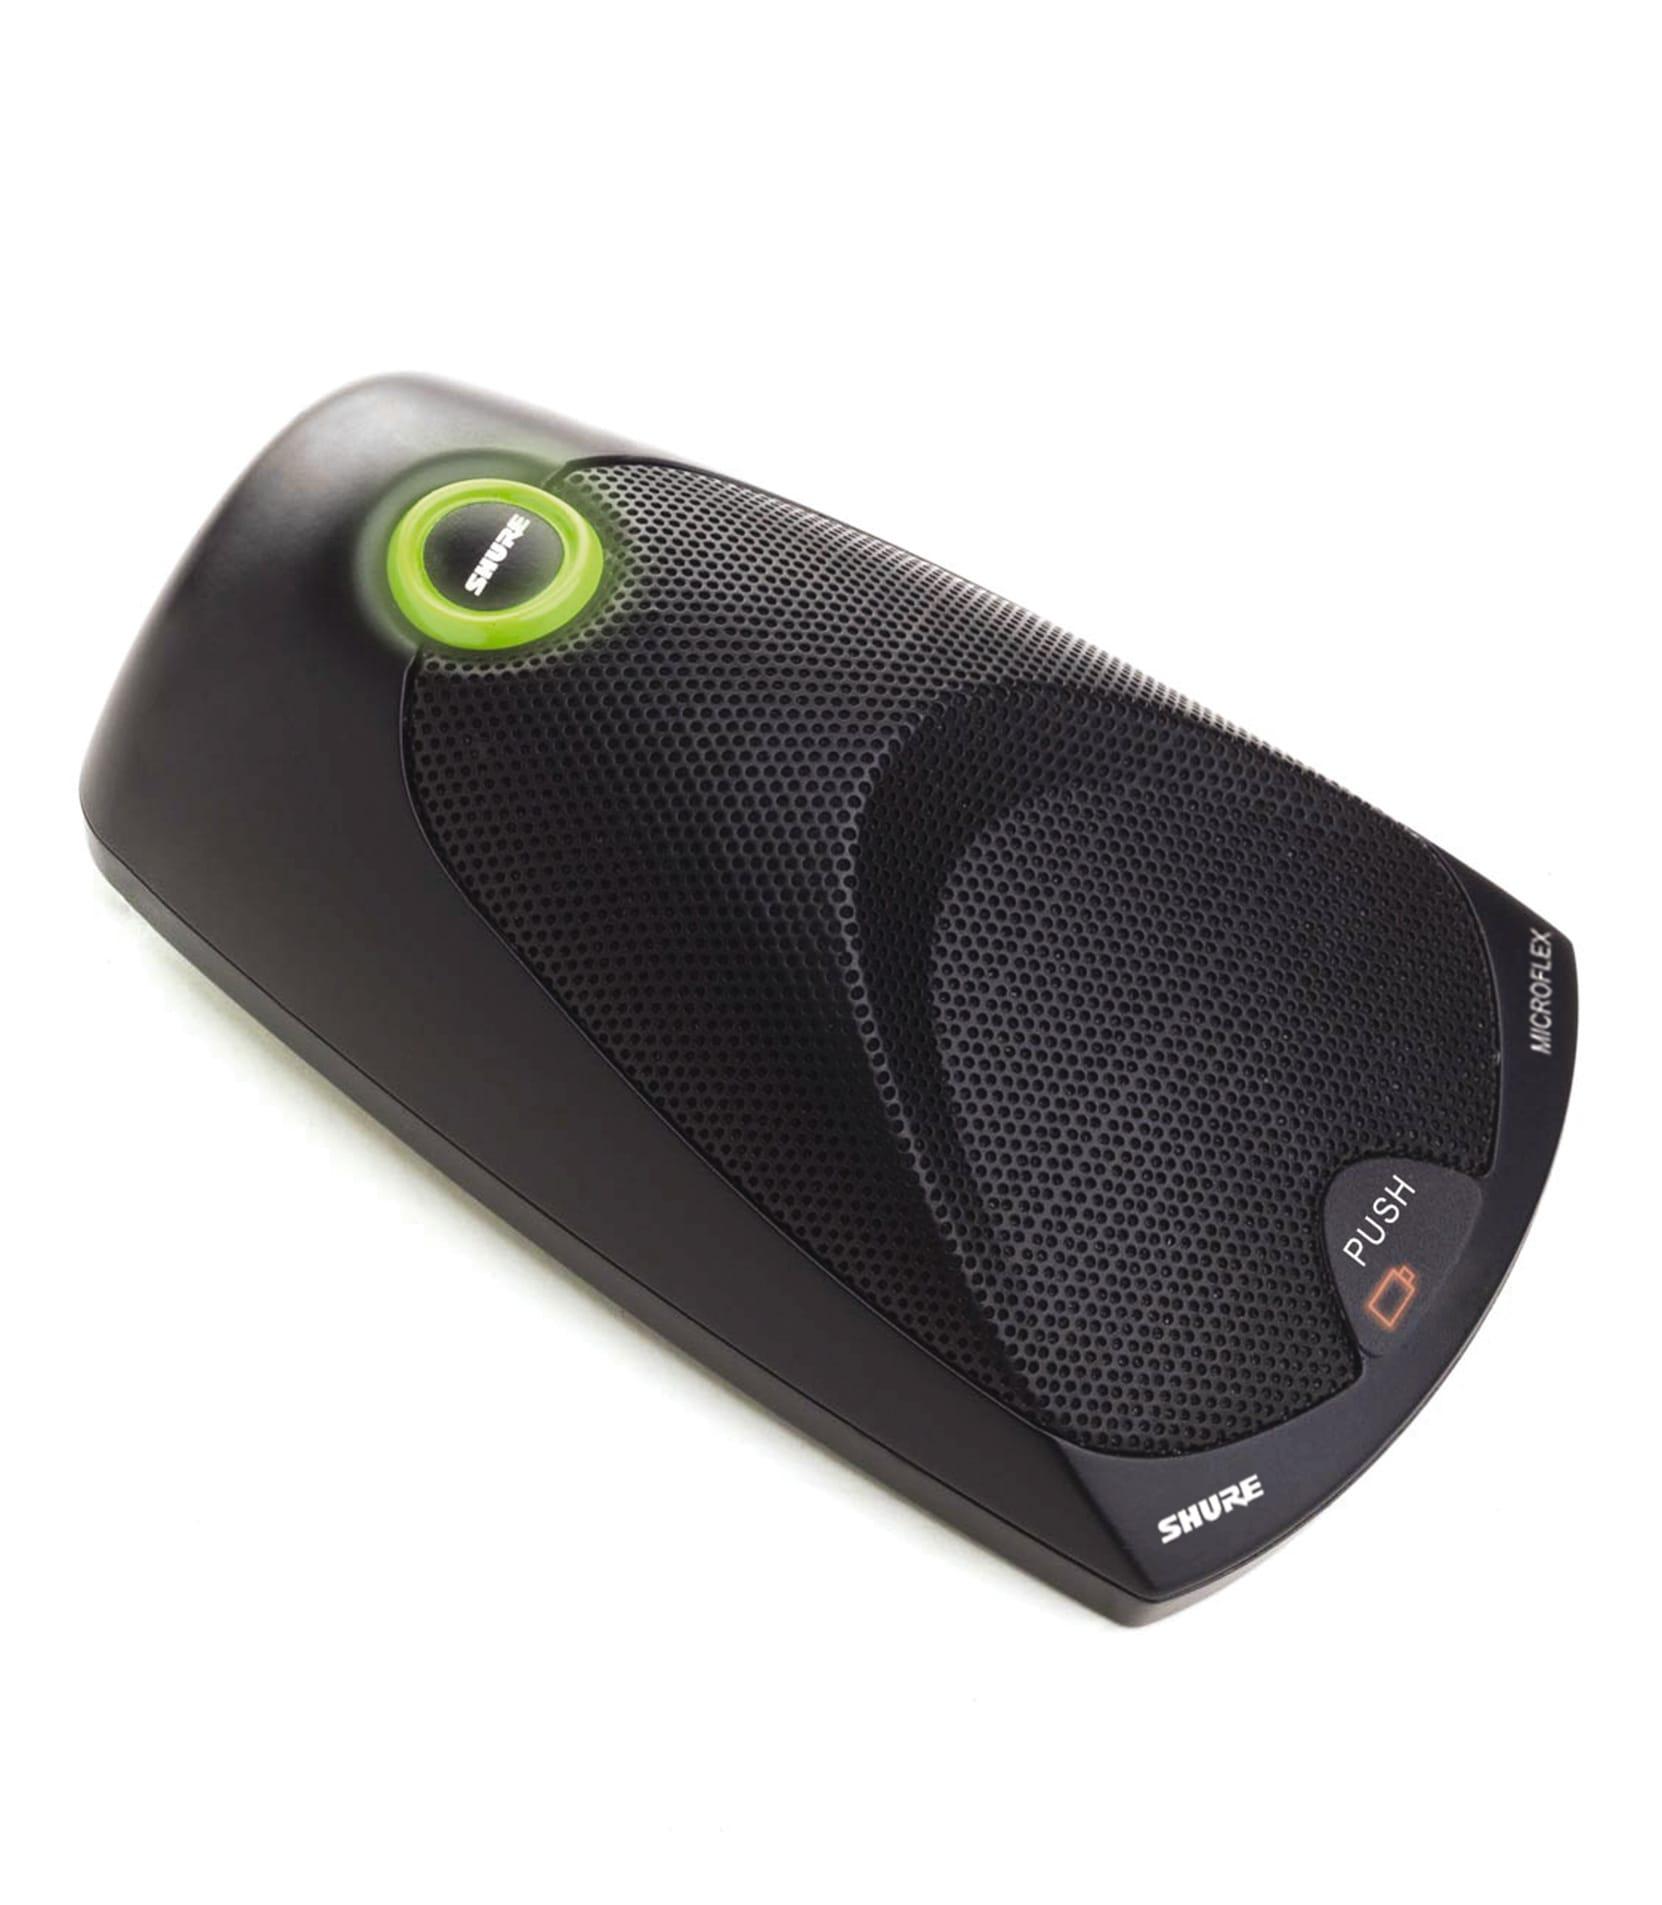 MX690 J3 - Buy Online